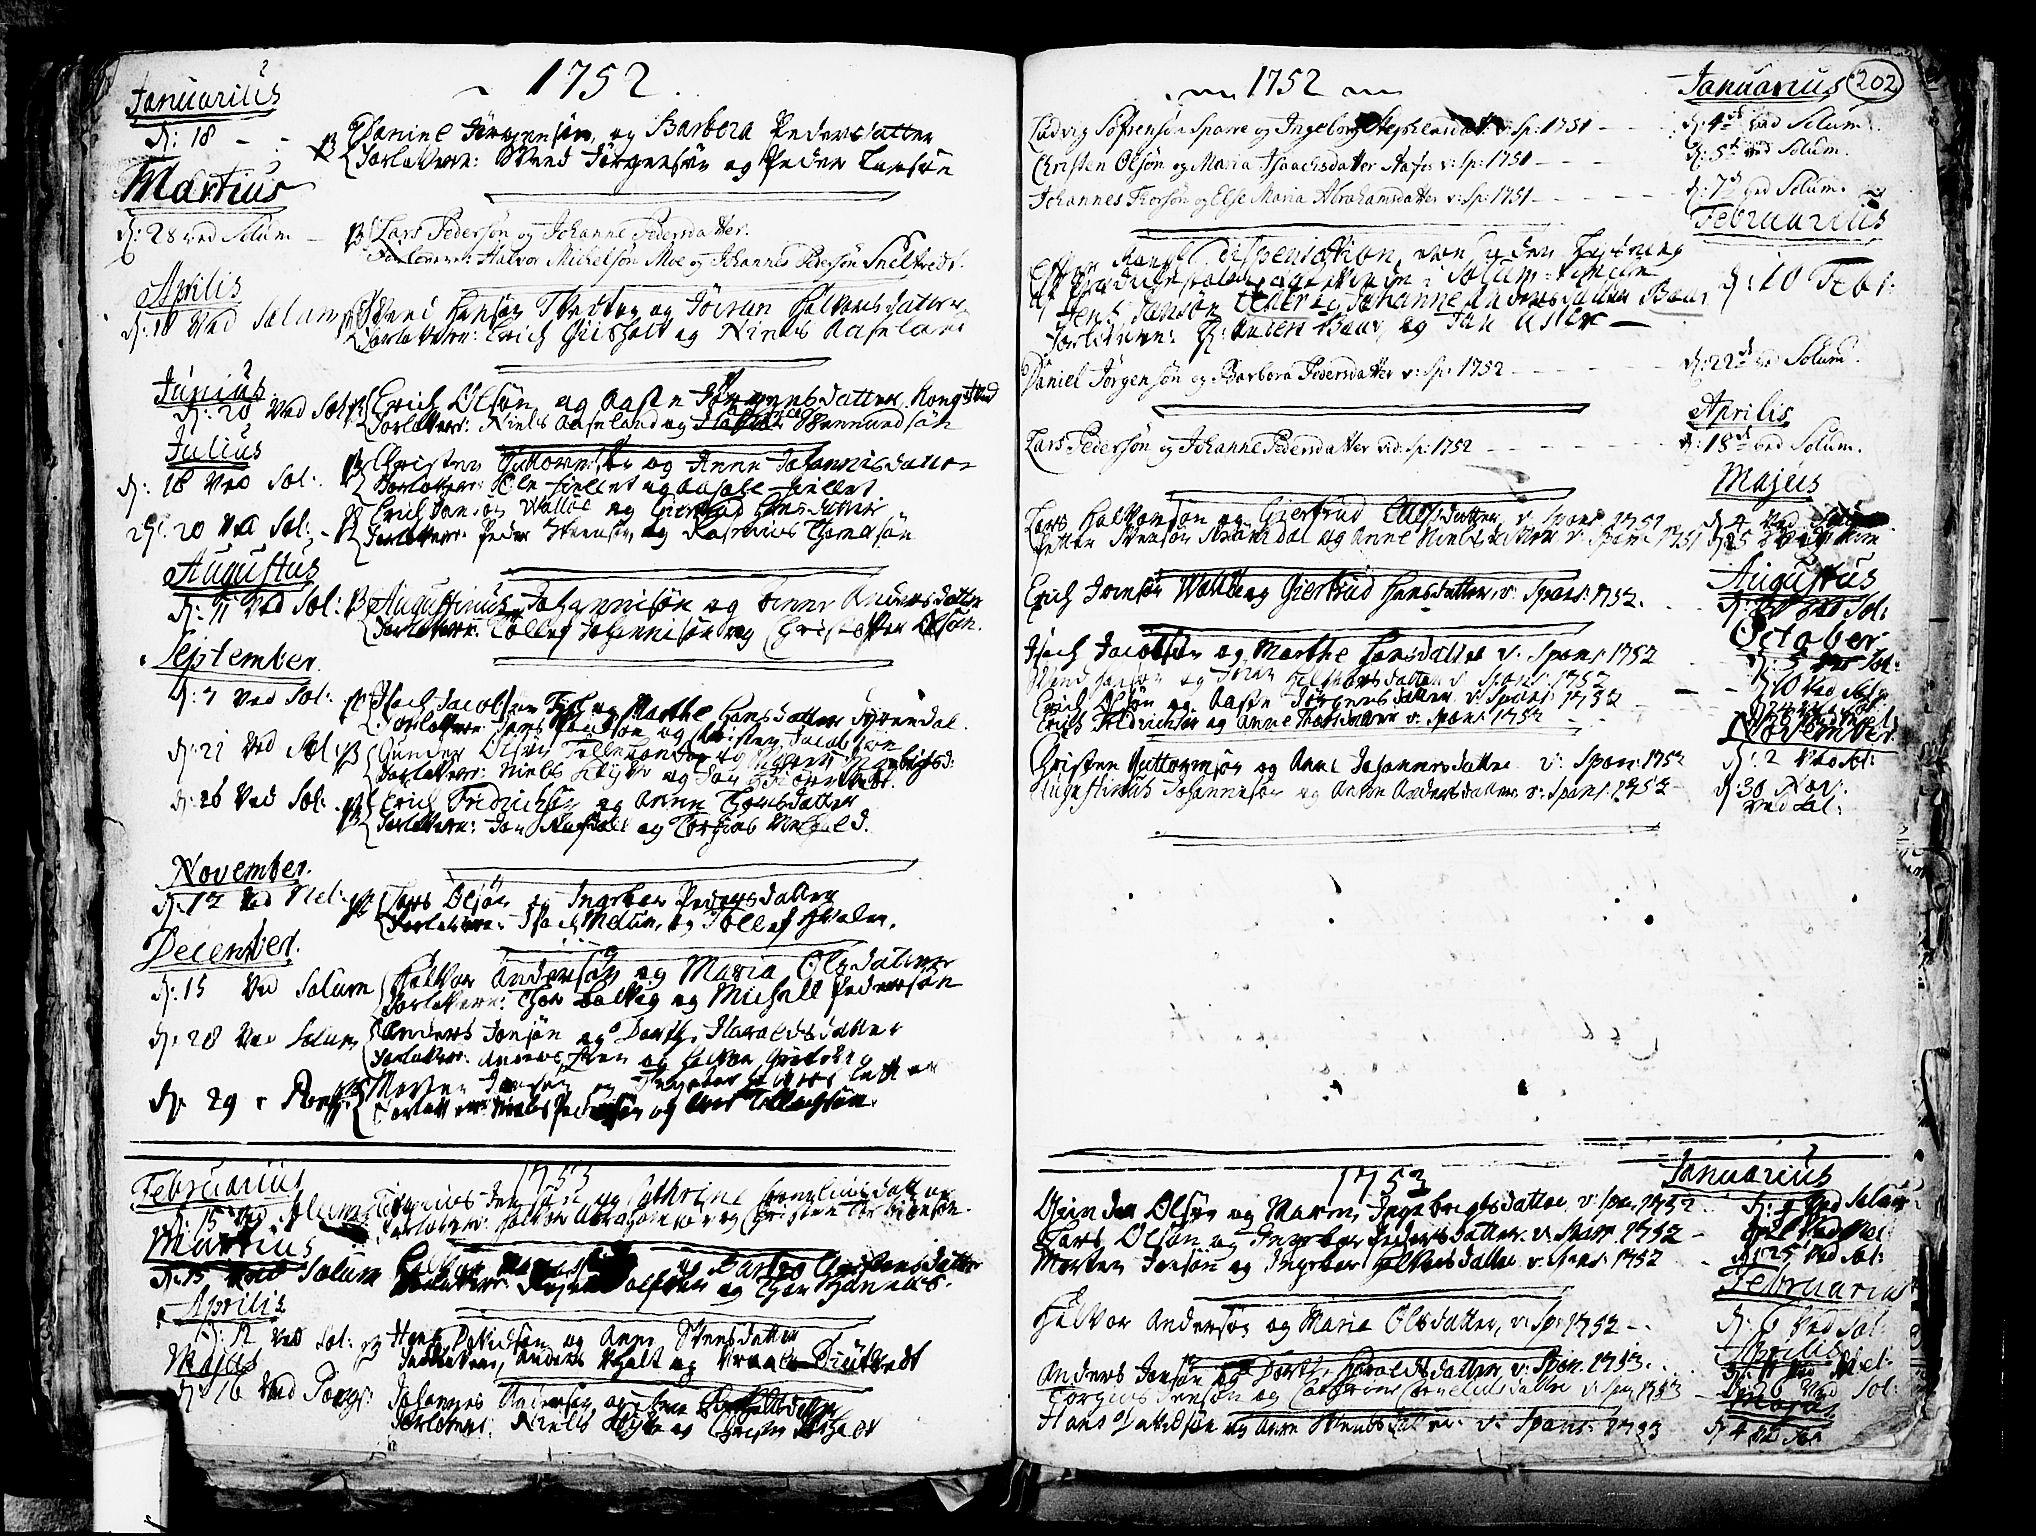 SAKO, Solum kirkebøker, F/Fa/L0002: Ministerialbok nr. I 2, 1713-1761, s. 202